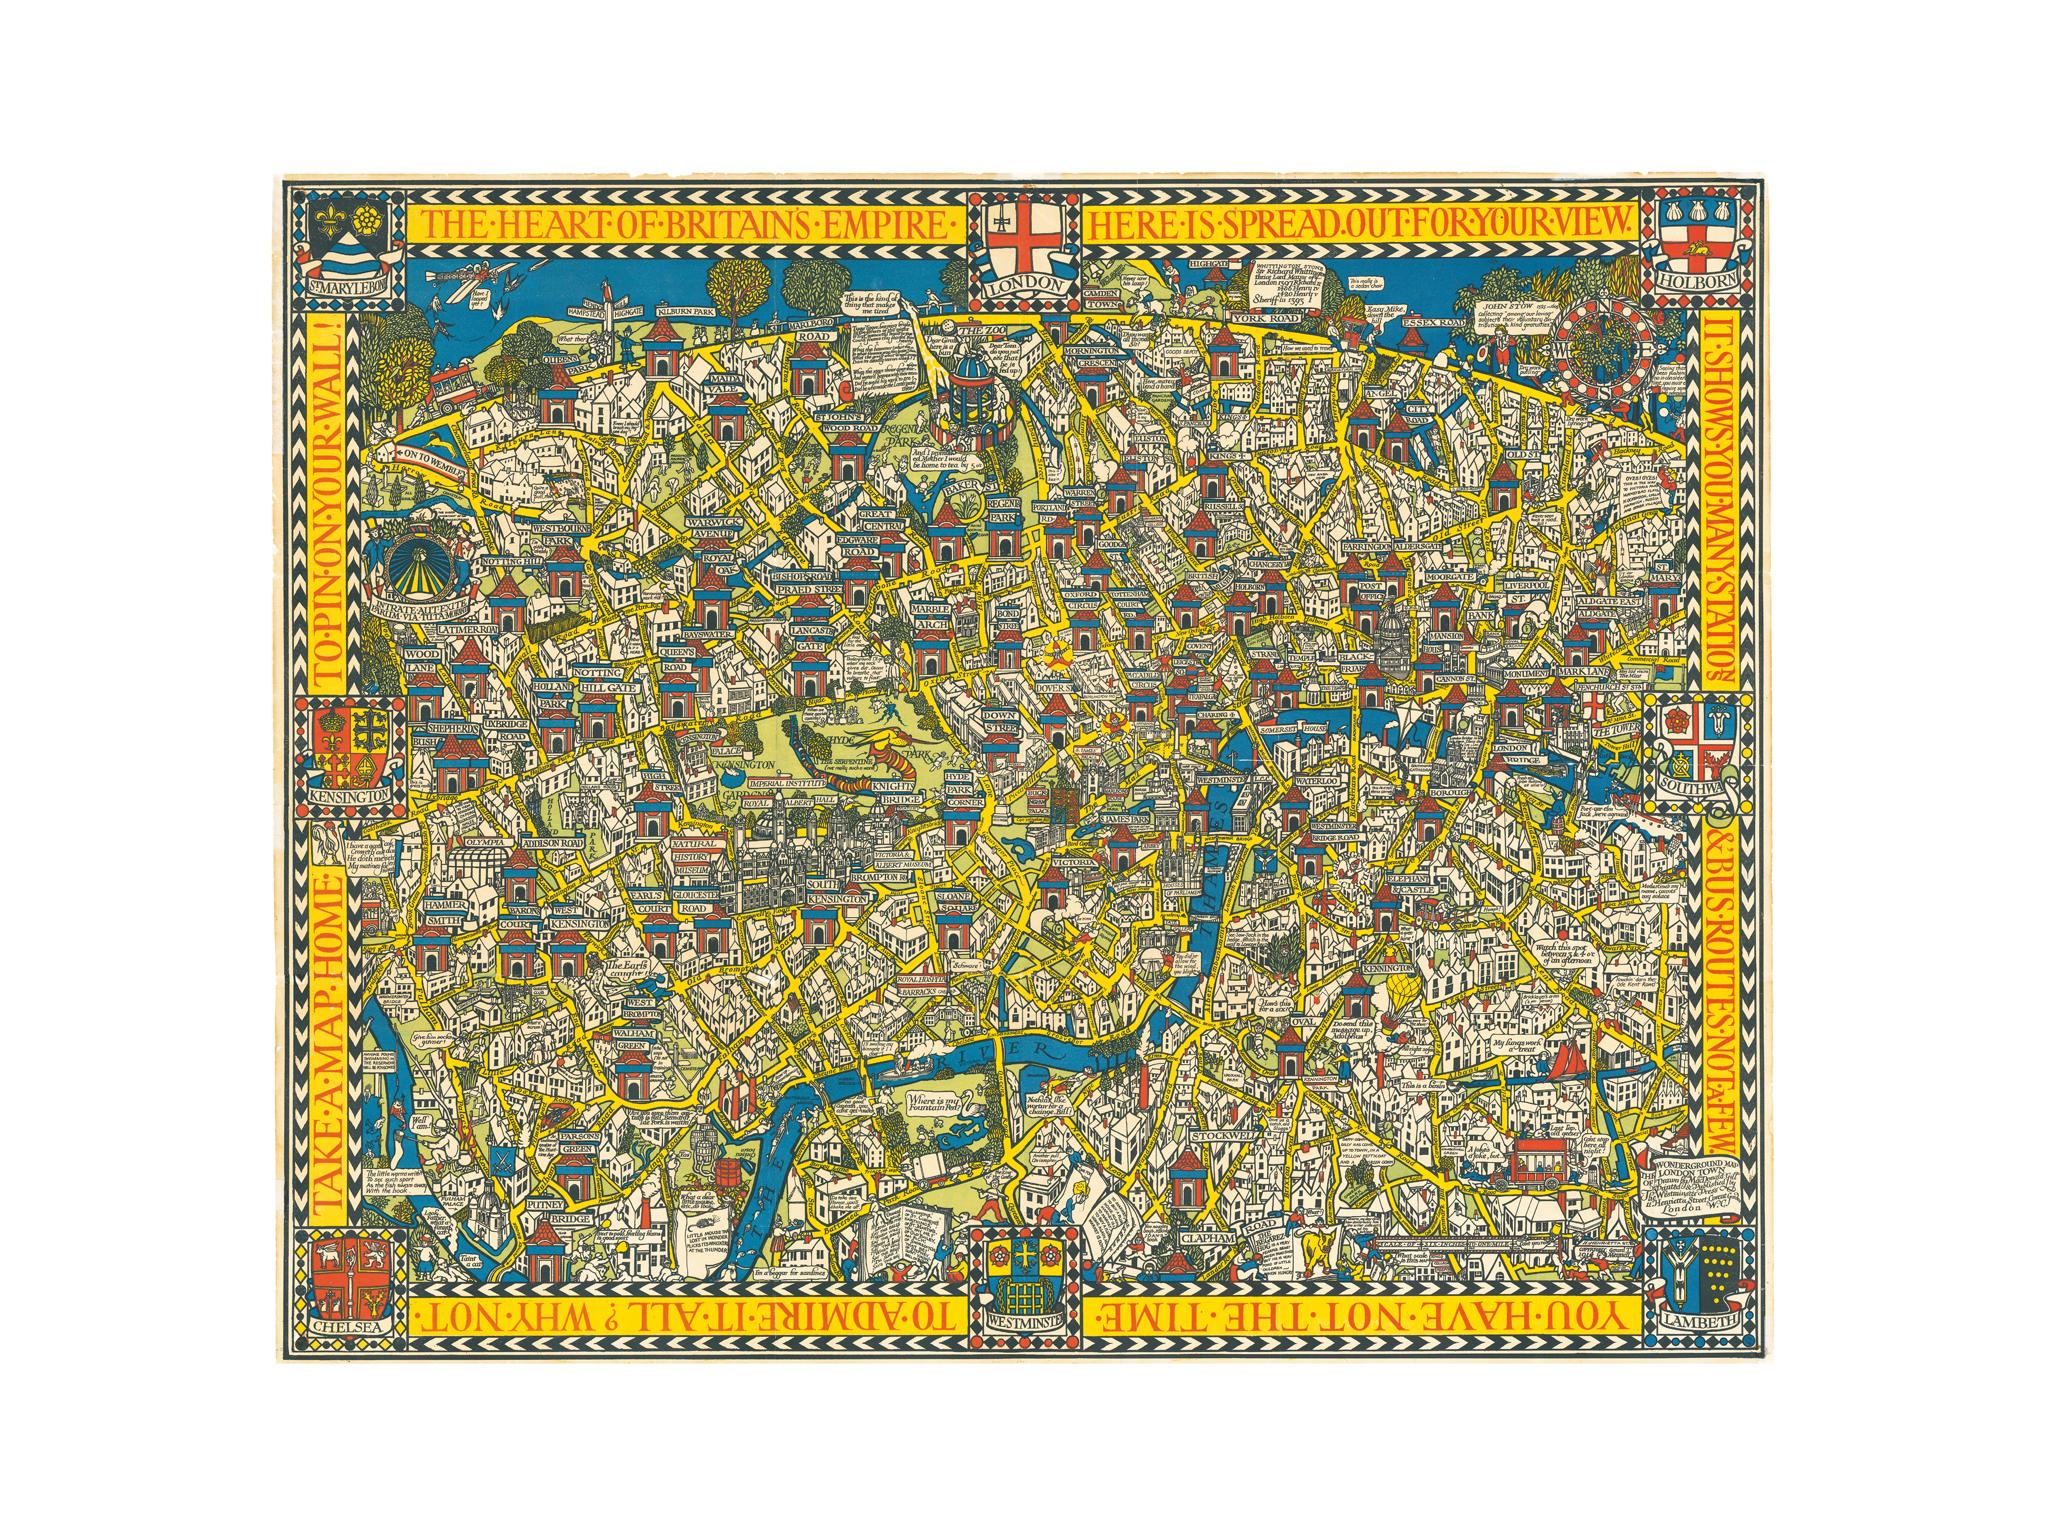 The Wonderground Map of London Town, 1914